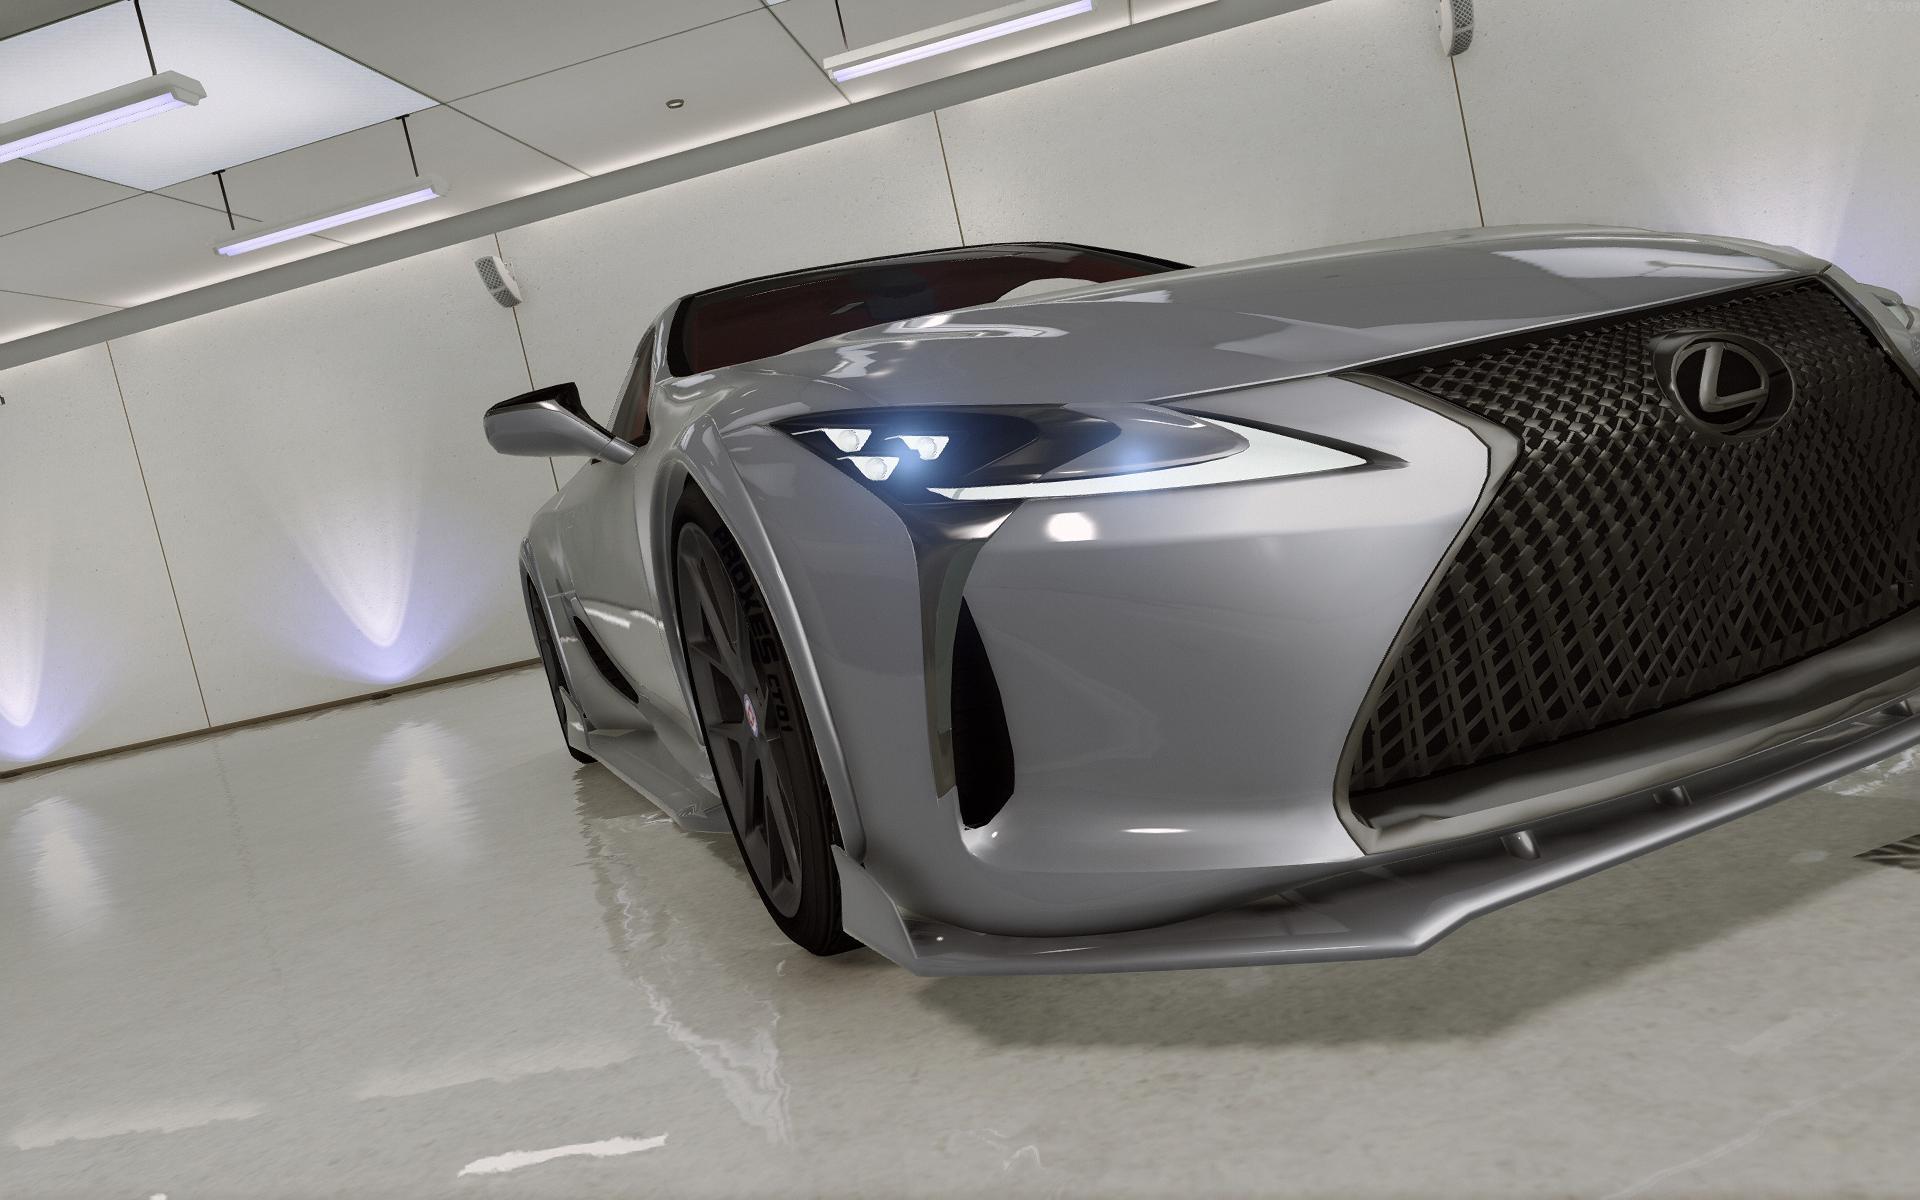 2018 Lexus Lc 500 Add On Tuning Hq Gta5 Mods Com